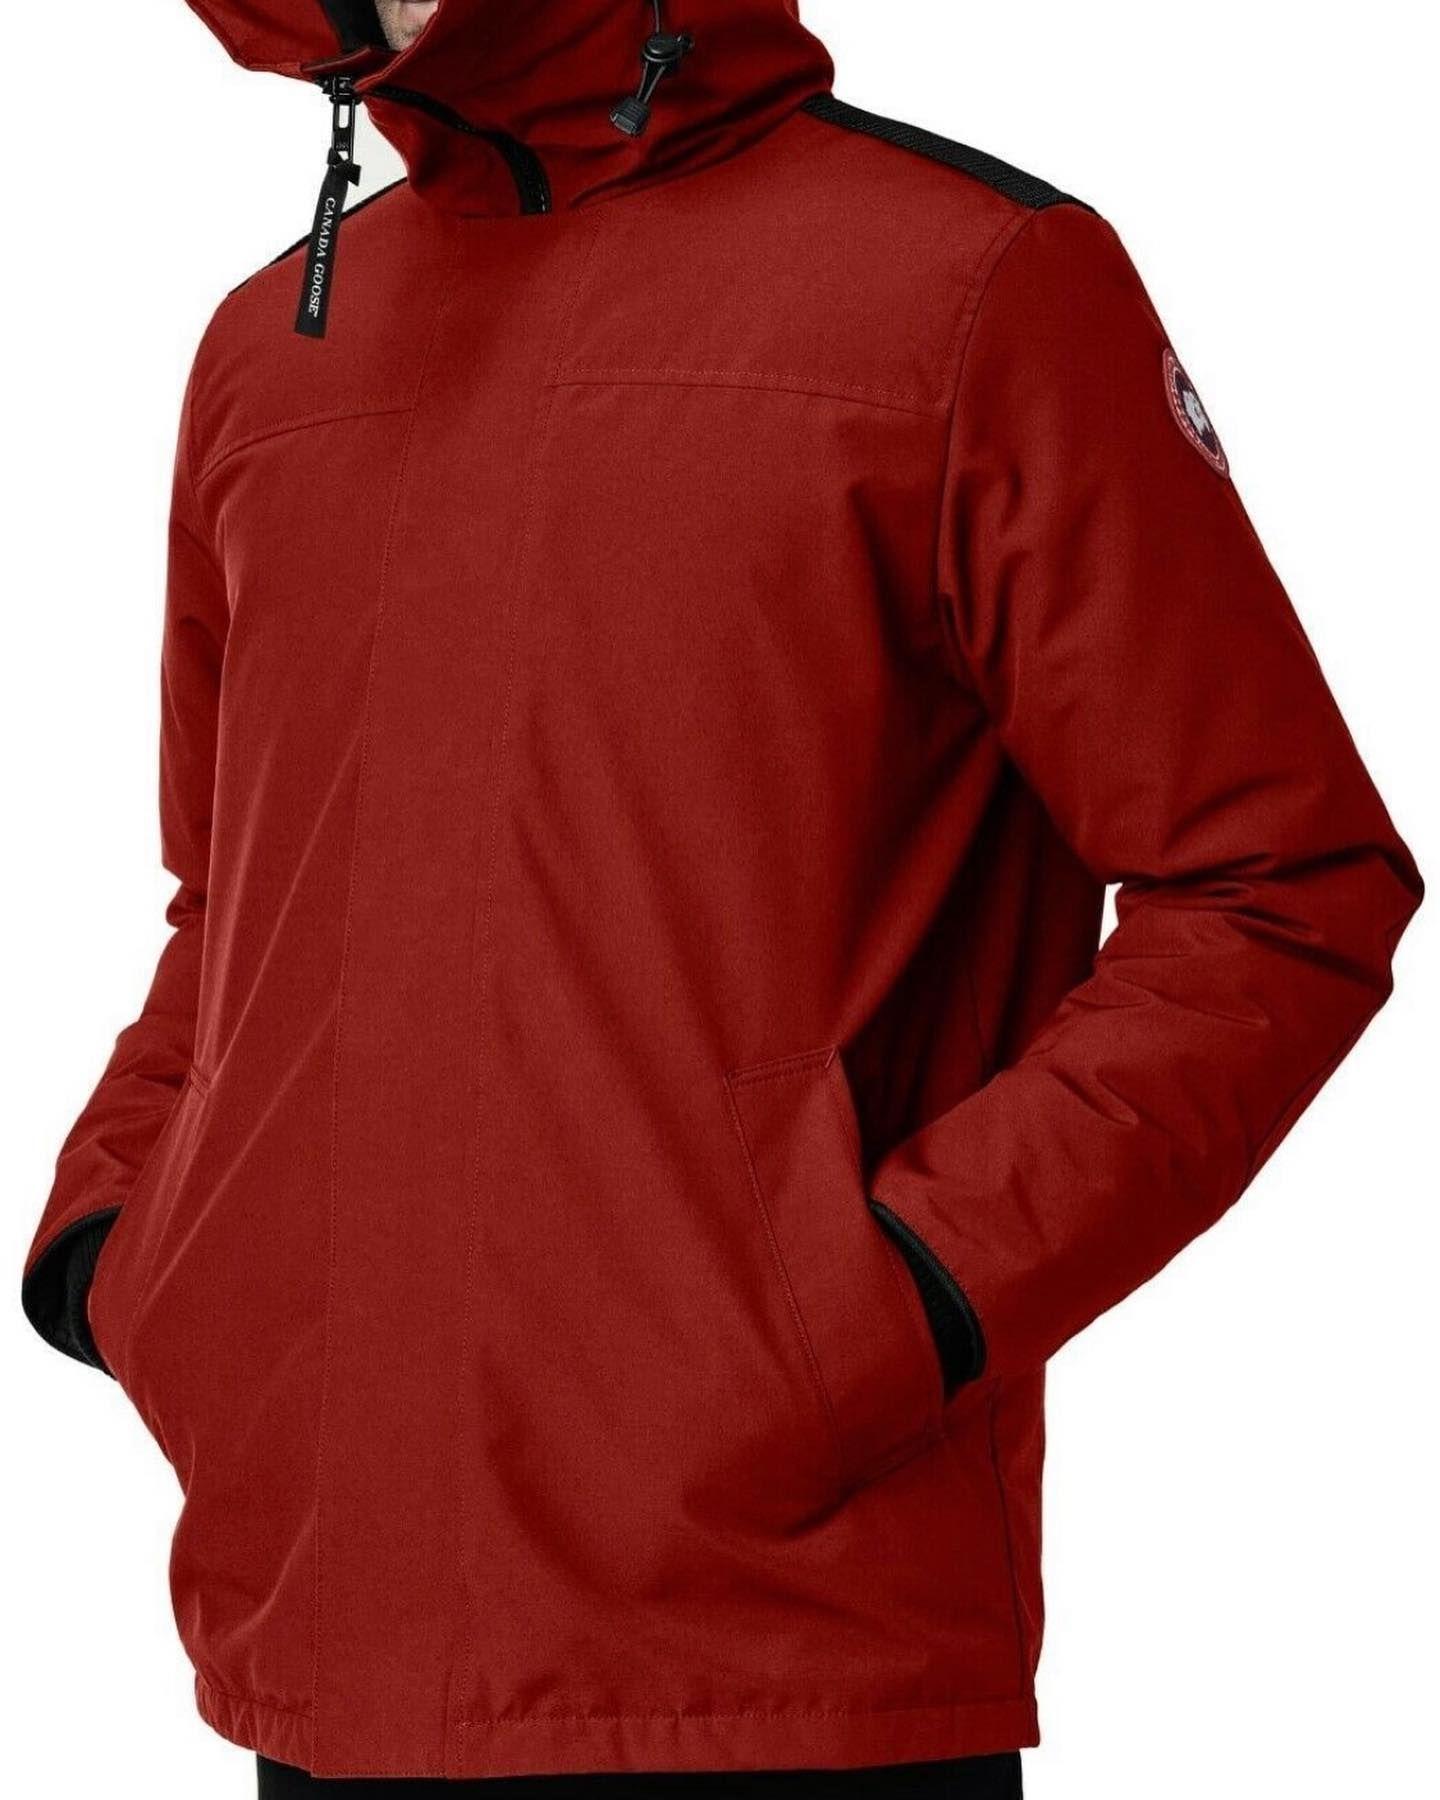 Canadagoose Garibaldi Designer Outerwear Coats Jackets Athletic Jacket [ 1800 x 1440 Pixel ]